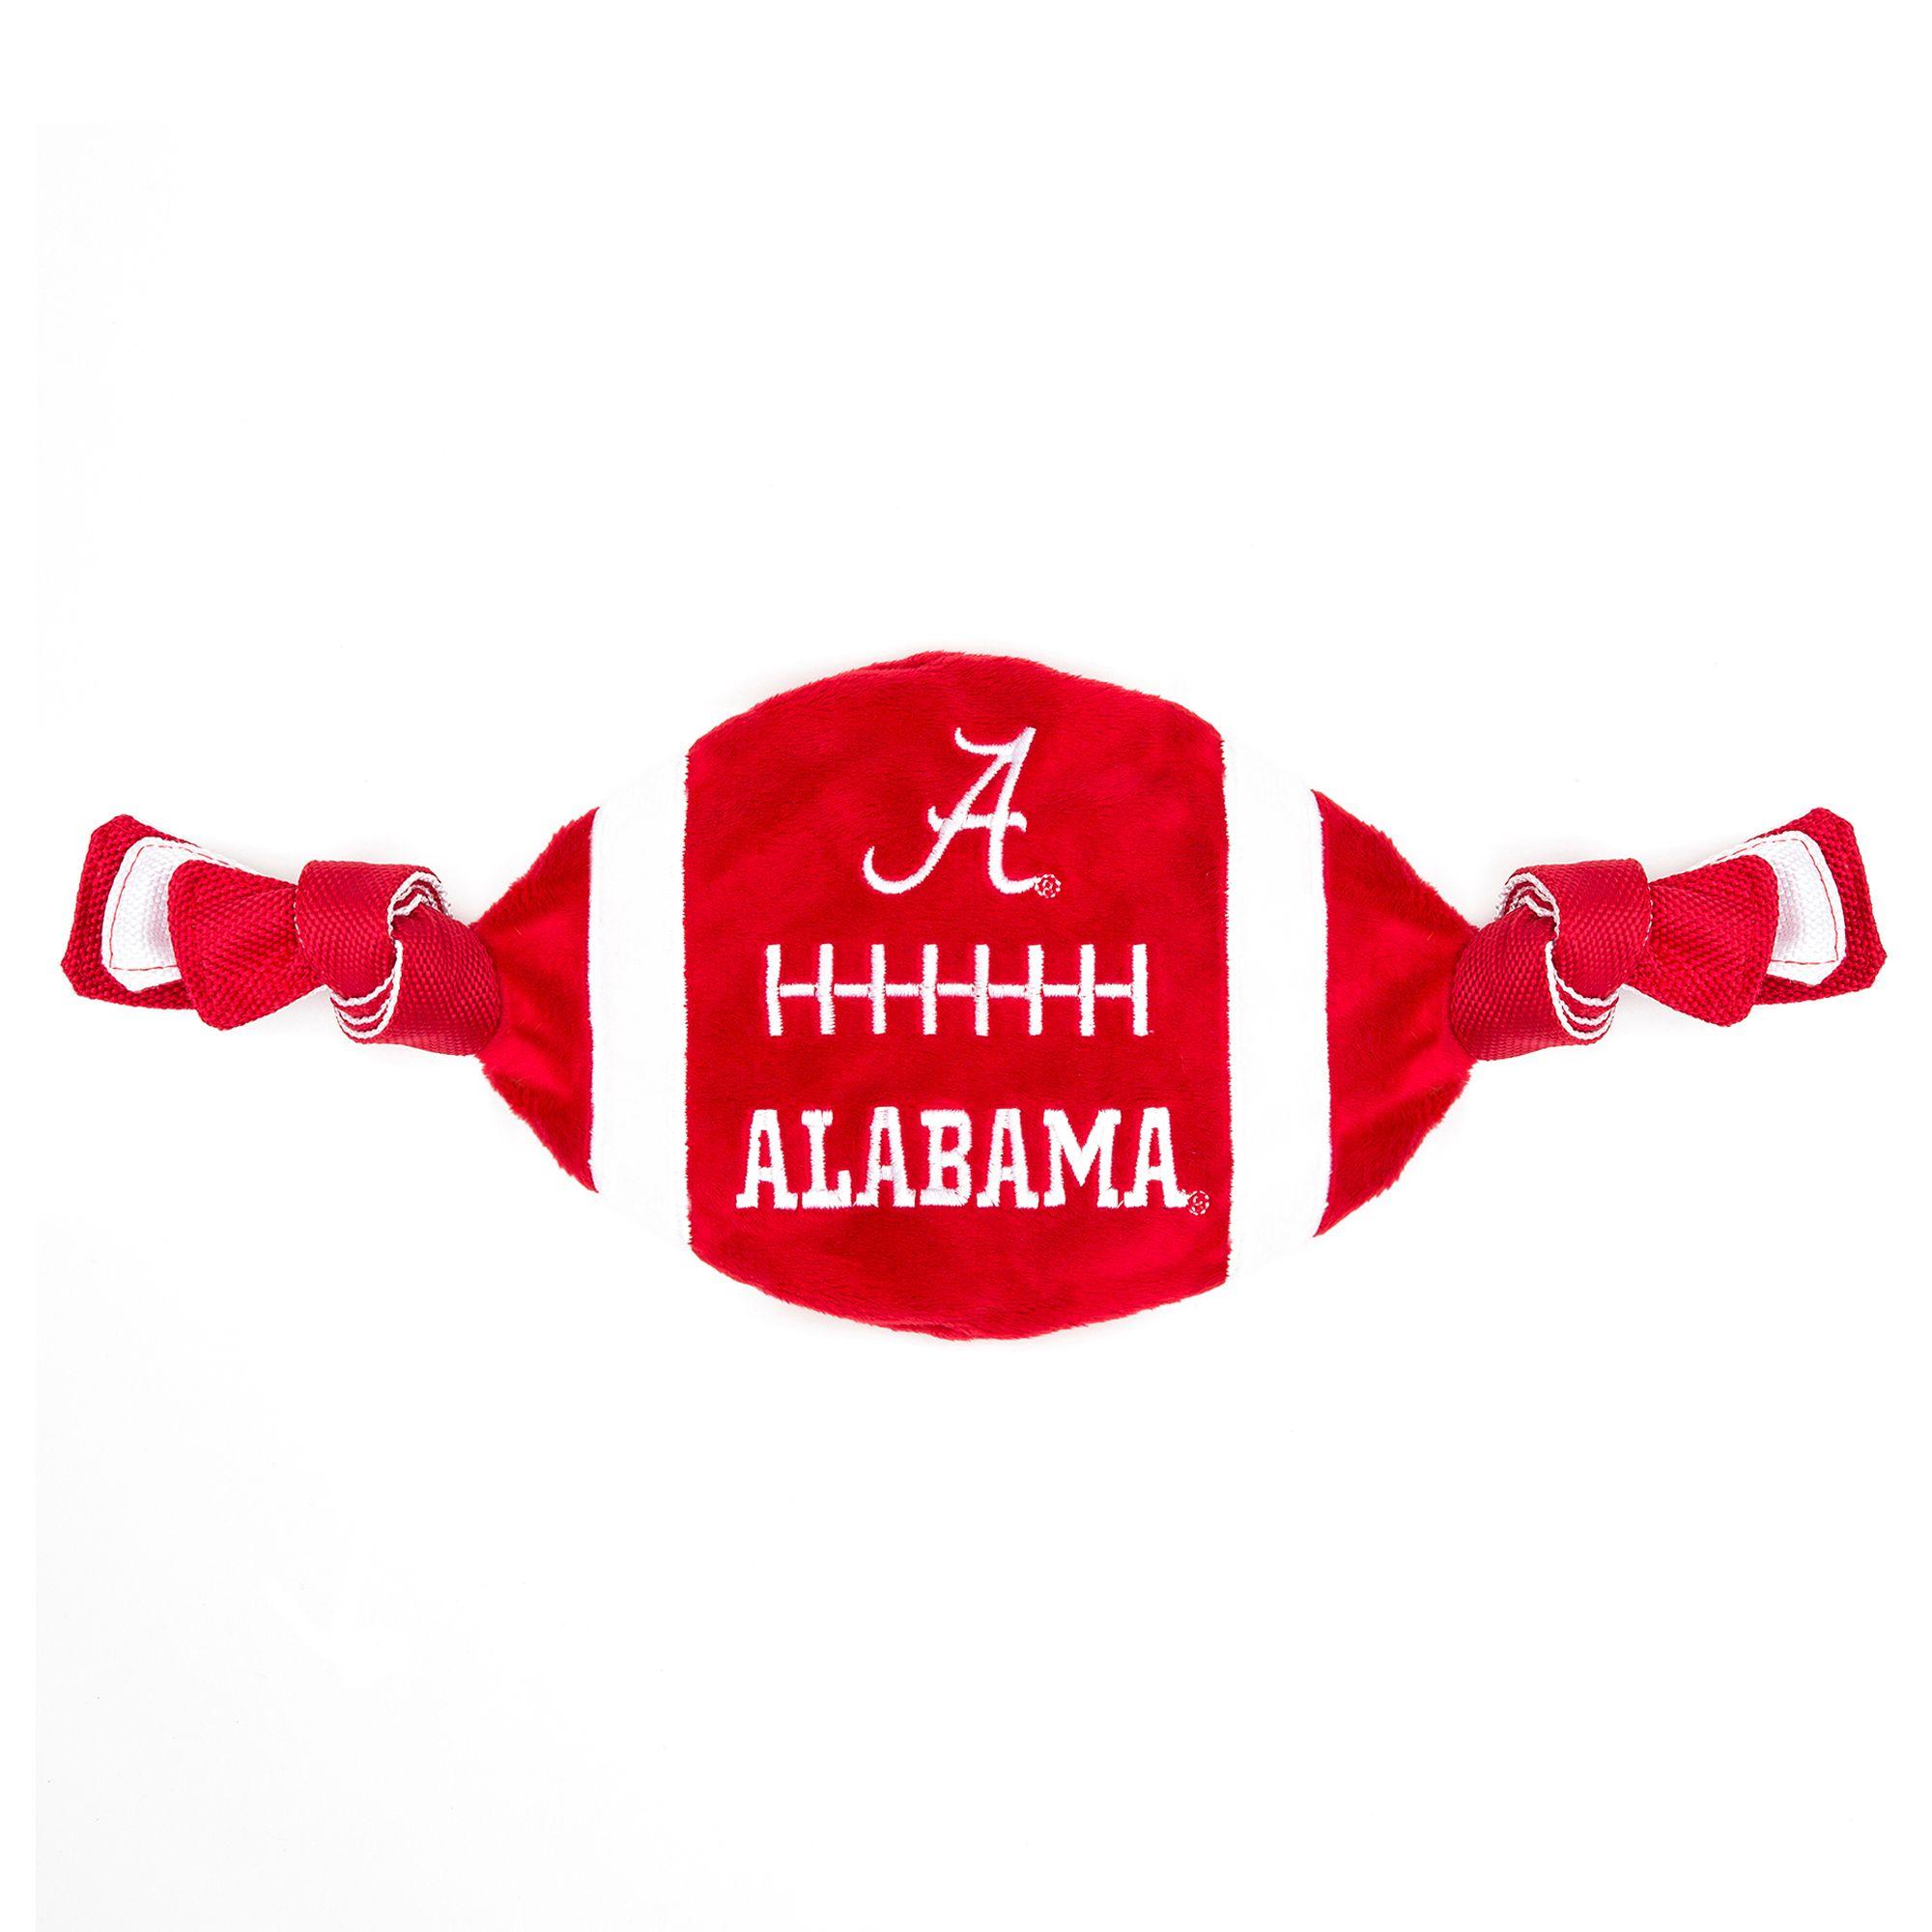 Alabama Crimson Tide Ncaa Flattie Crinkle Football Toy Pets First